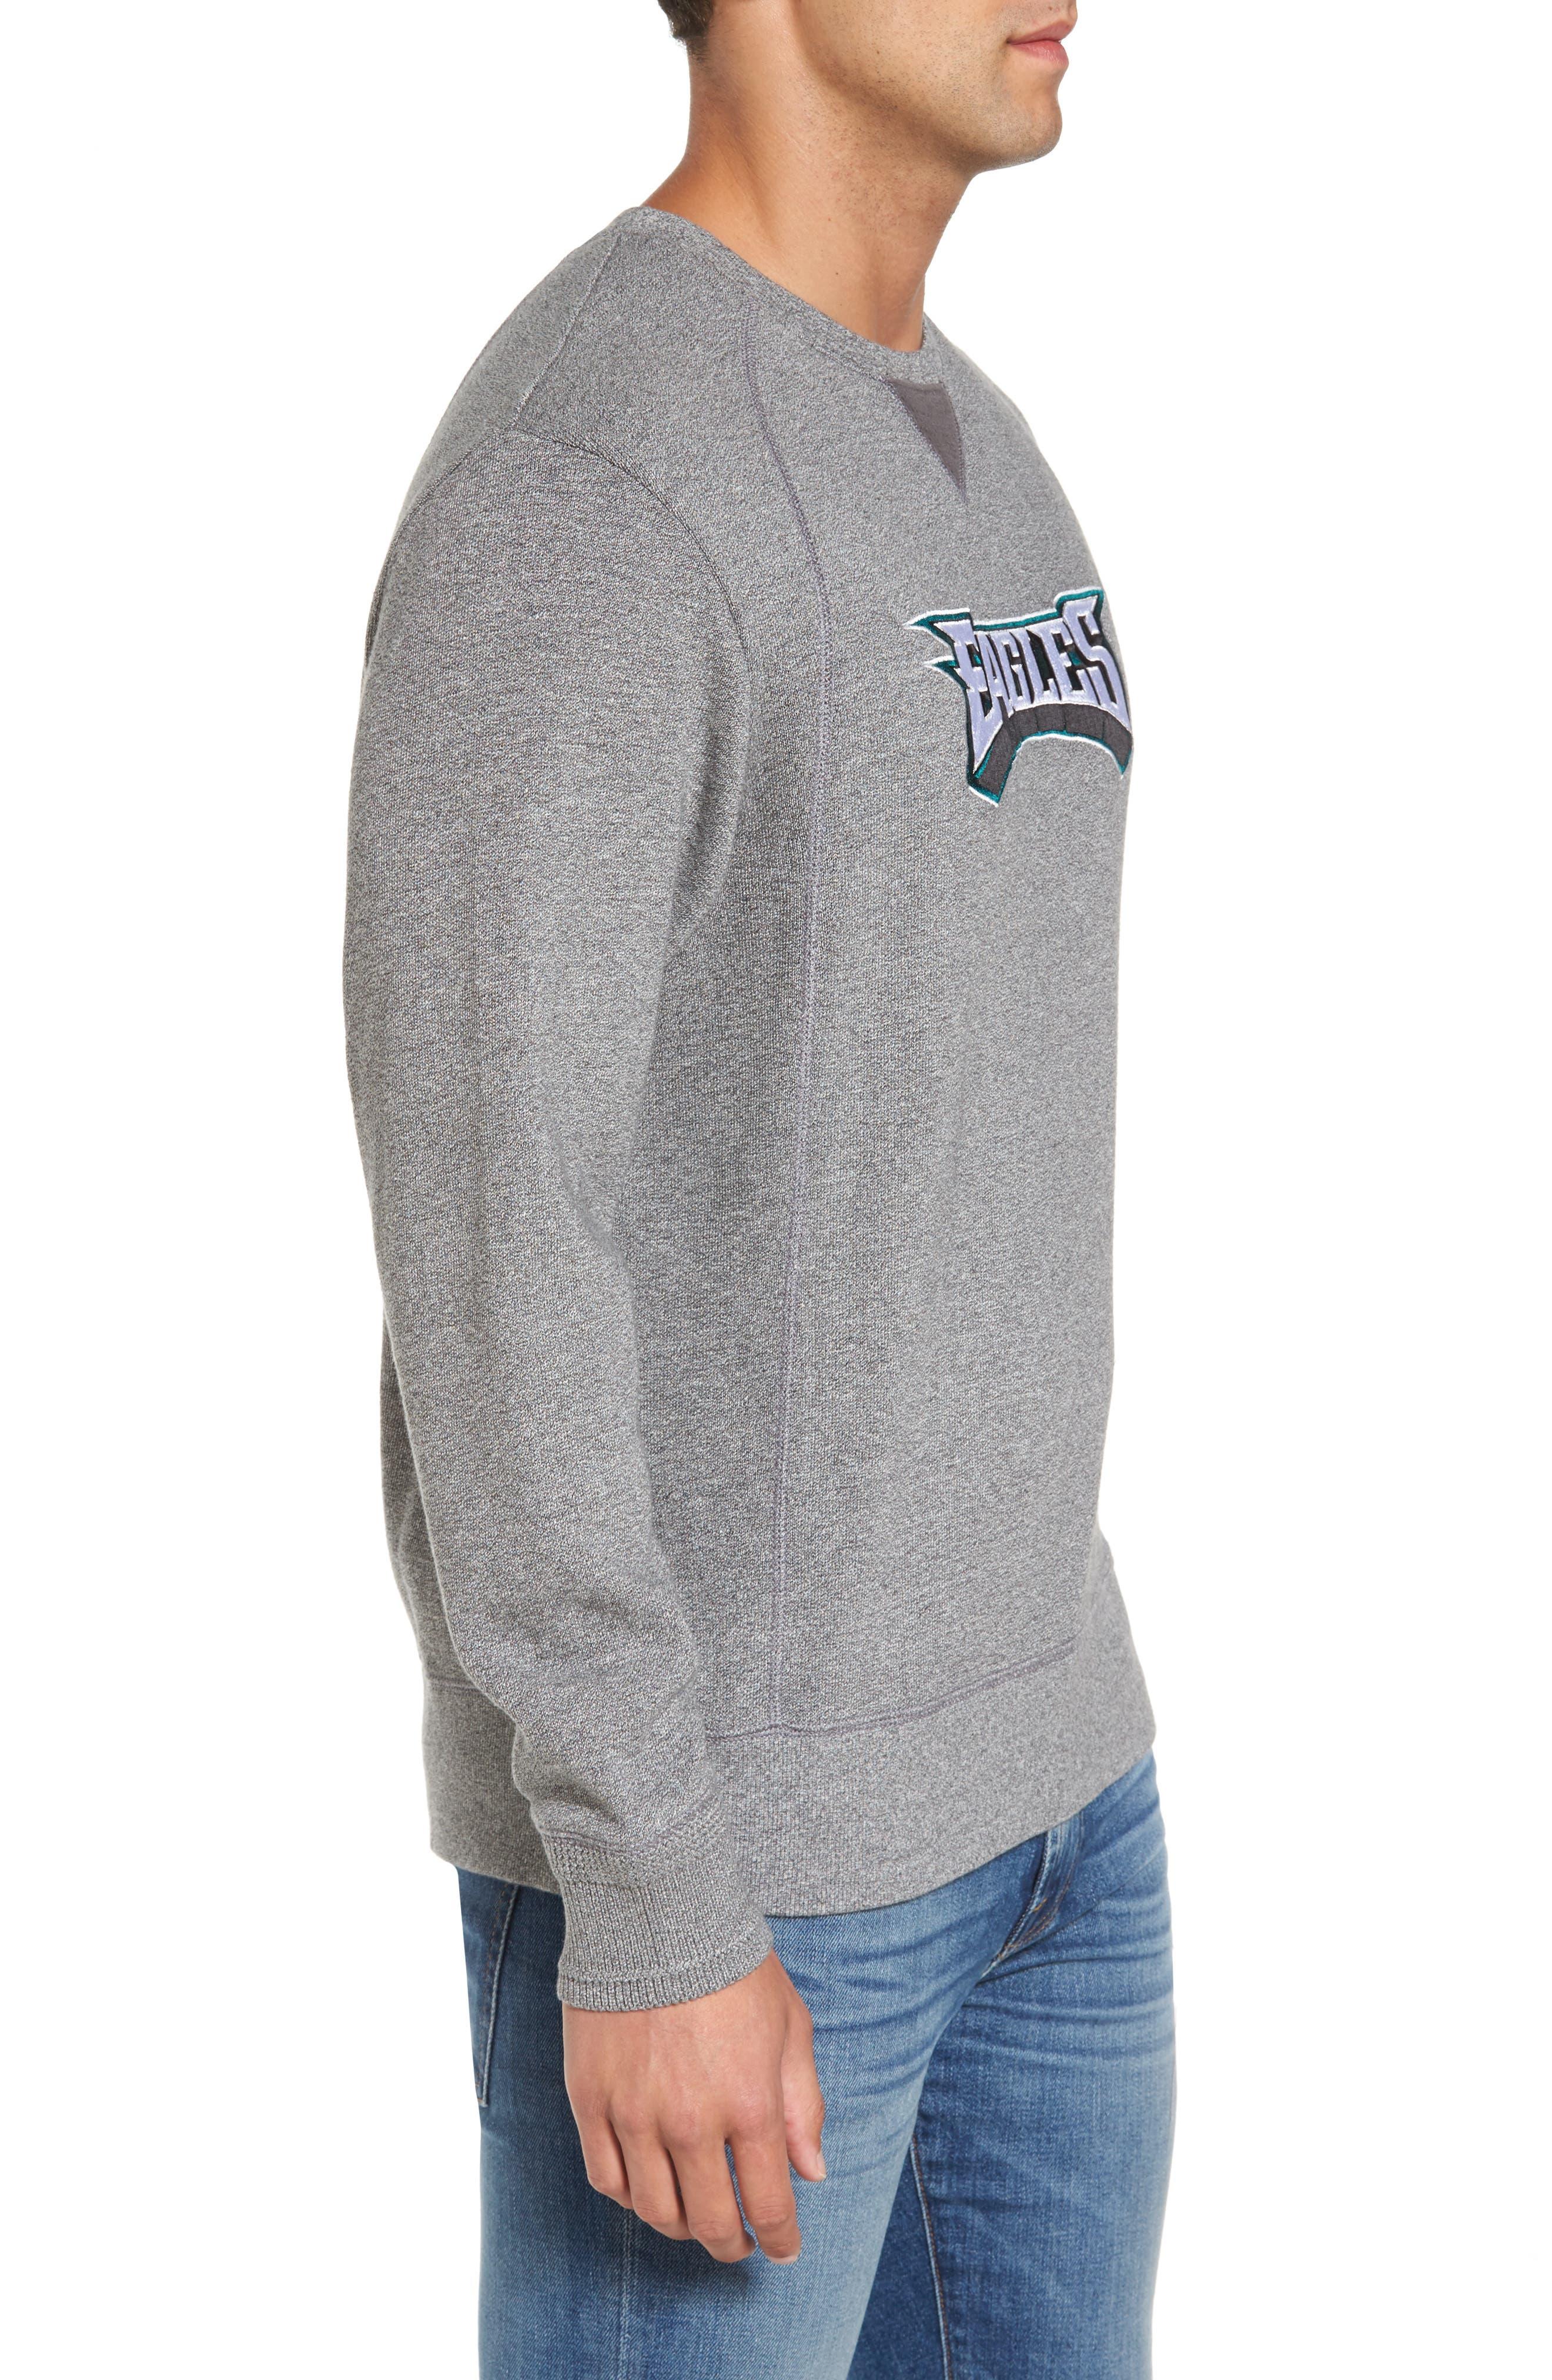 NFL Stitch of Liberty Embroidered Crewneck Sweatshirt,                             Alternate thumbnail 76, color,